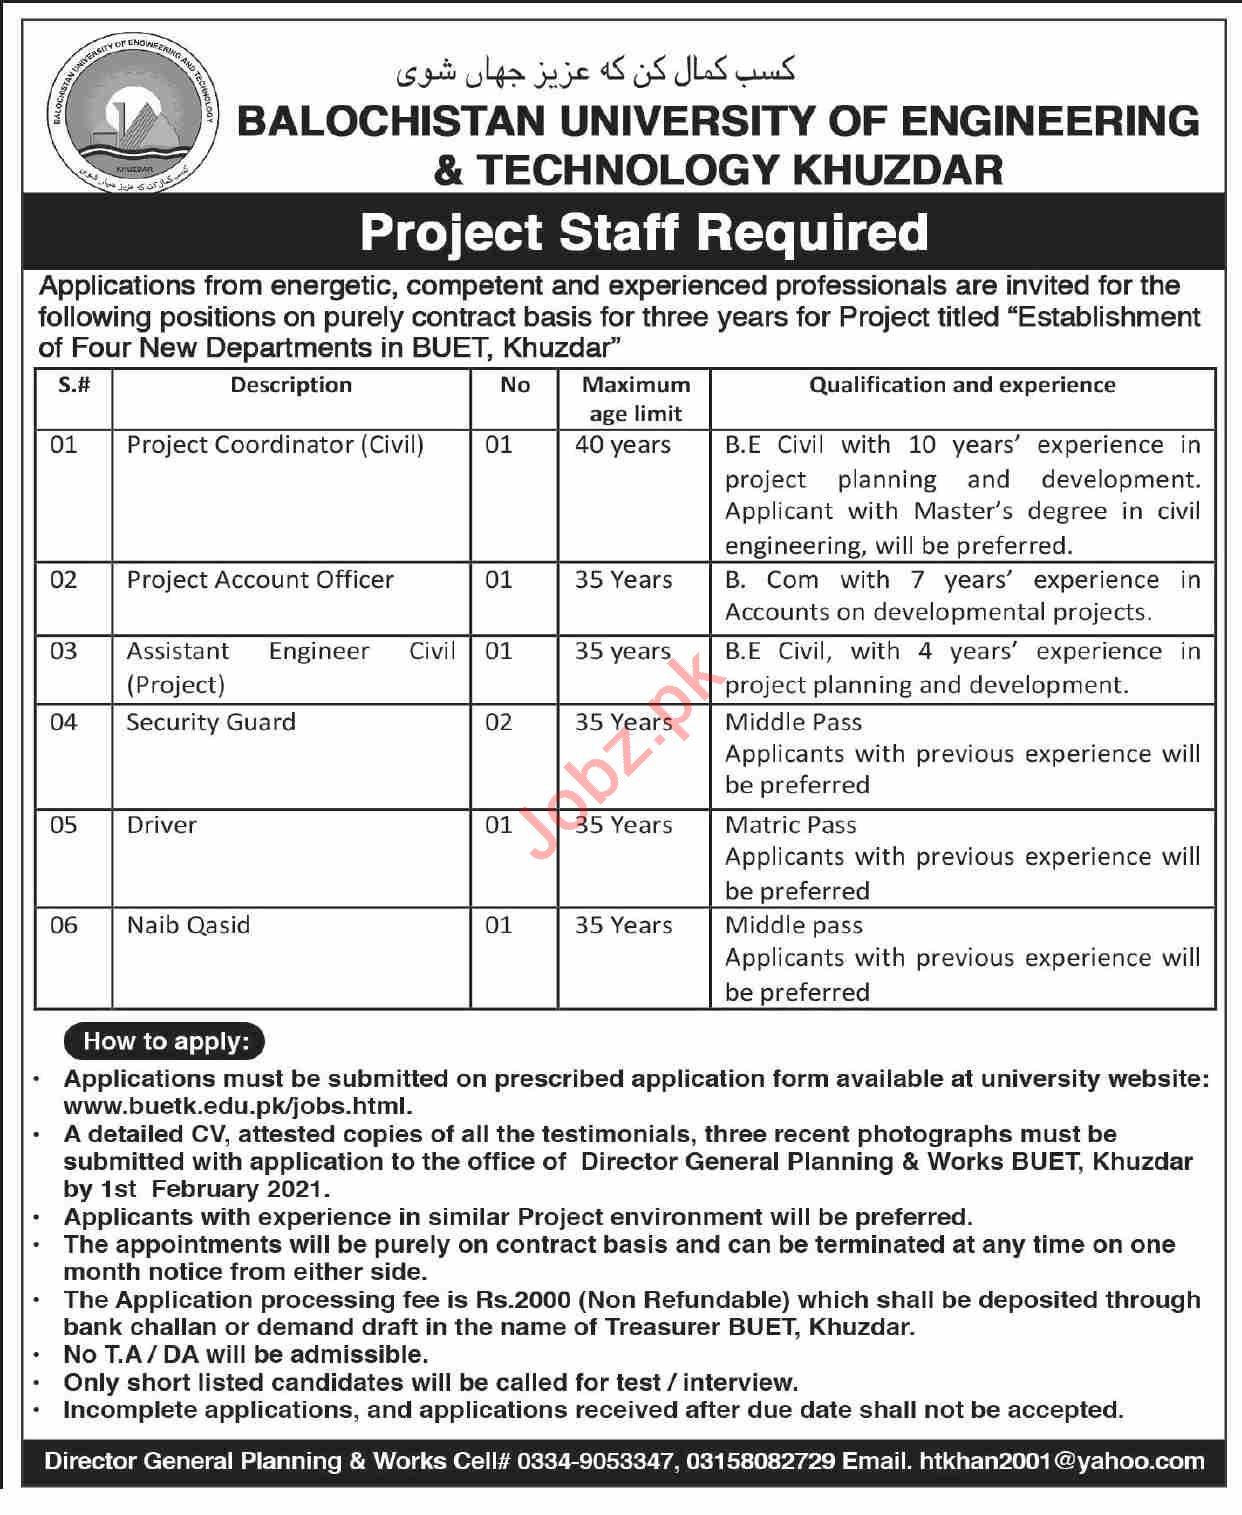 Balochistan University of Engineering BUET Khuzdar Jobs 2021